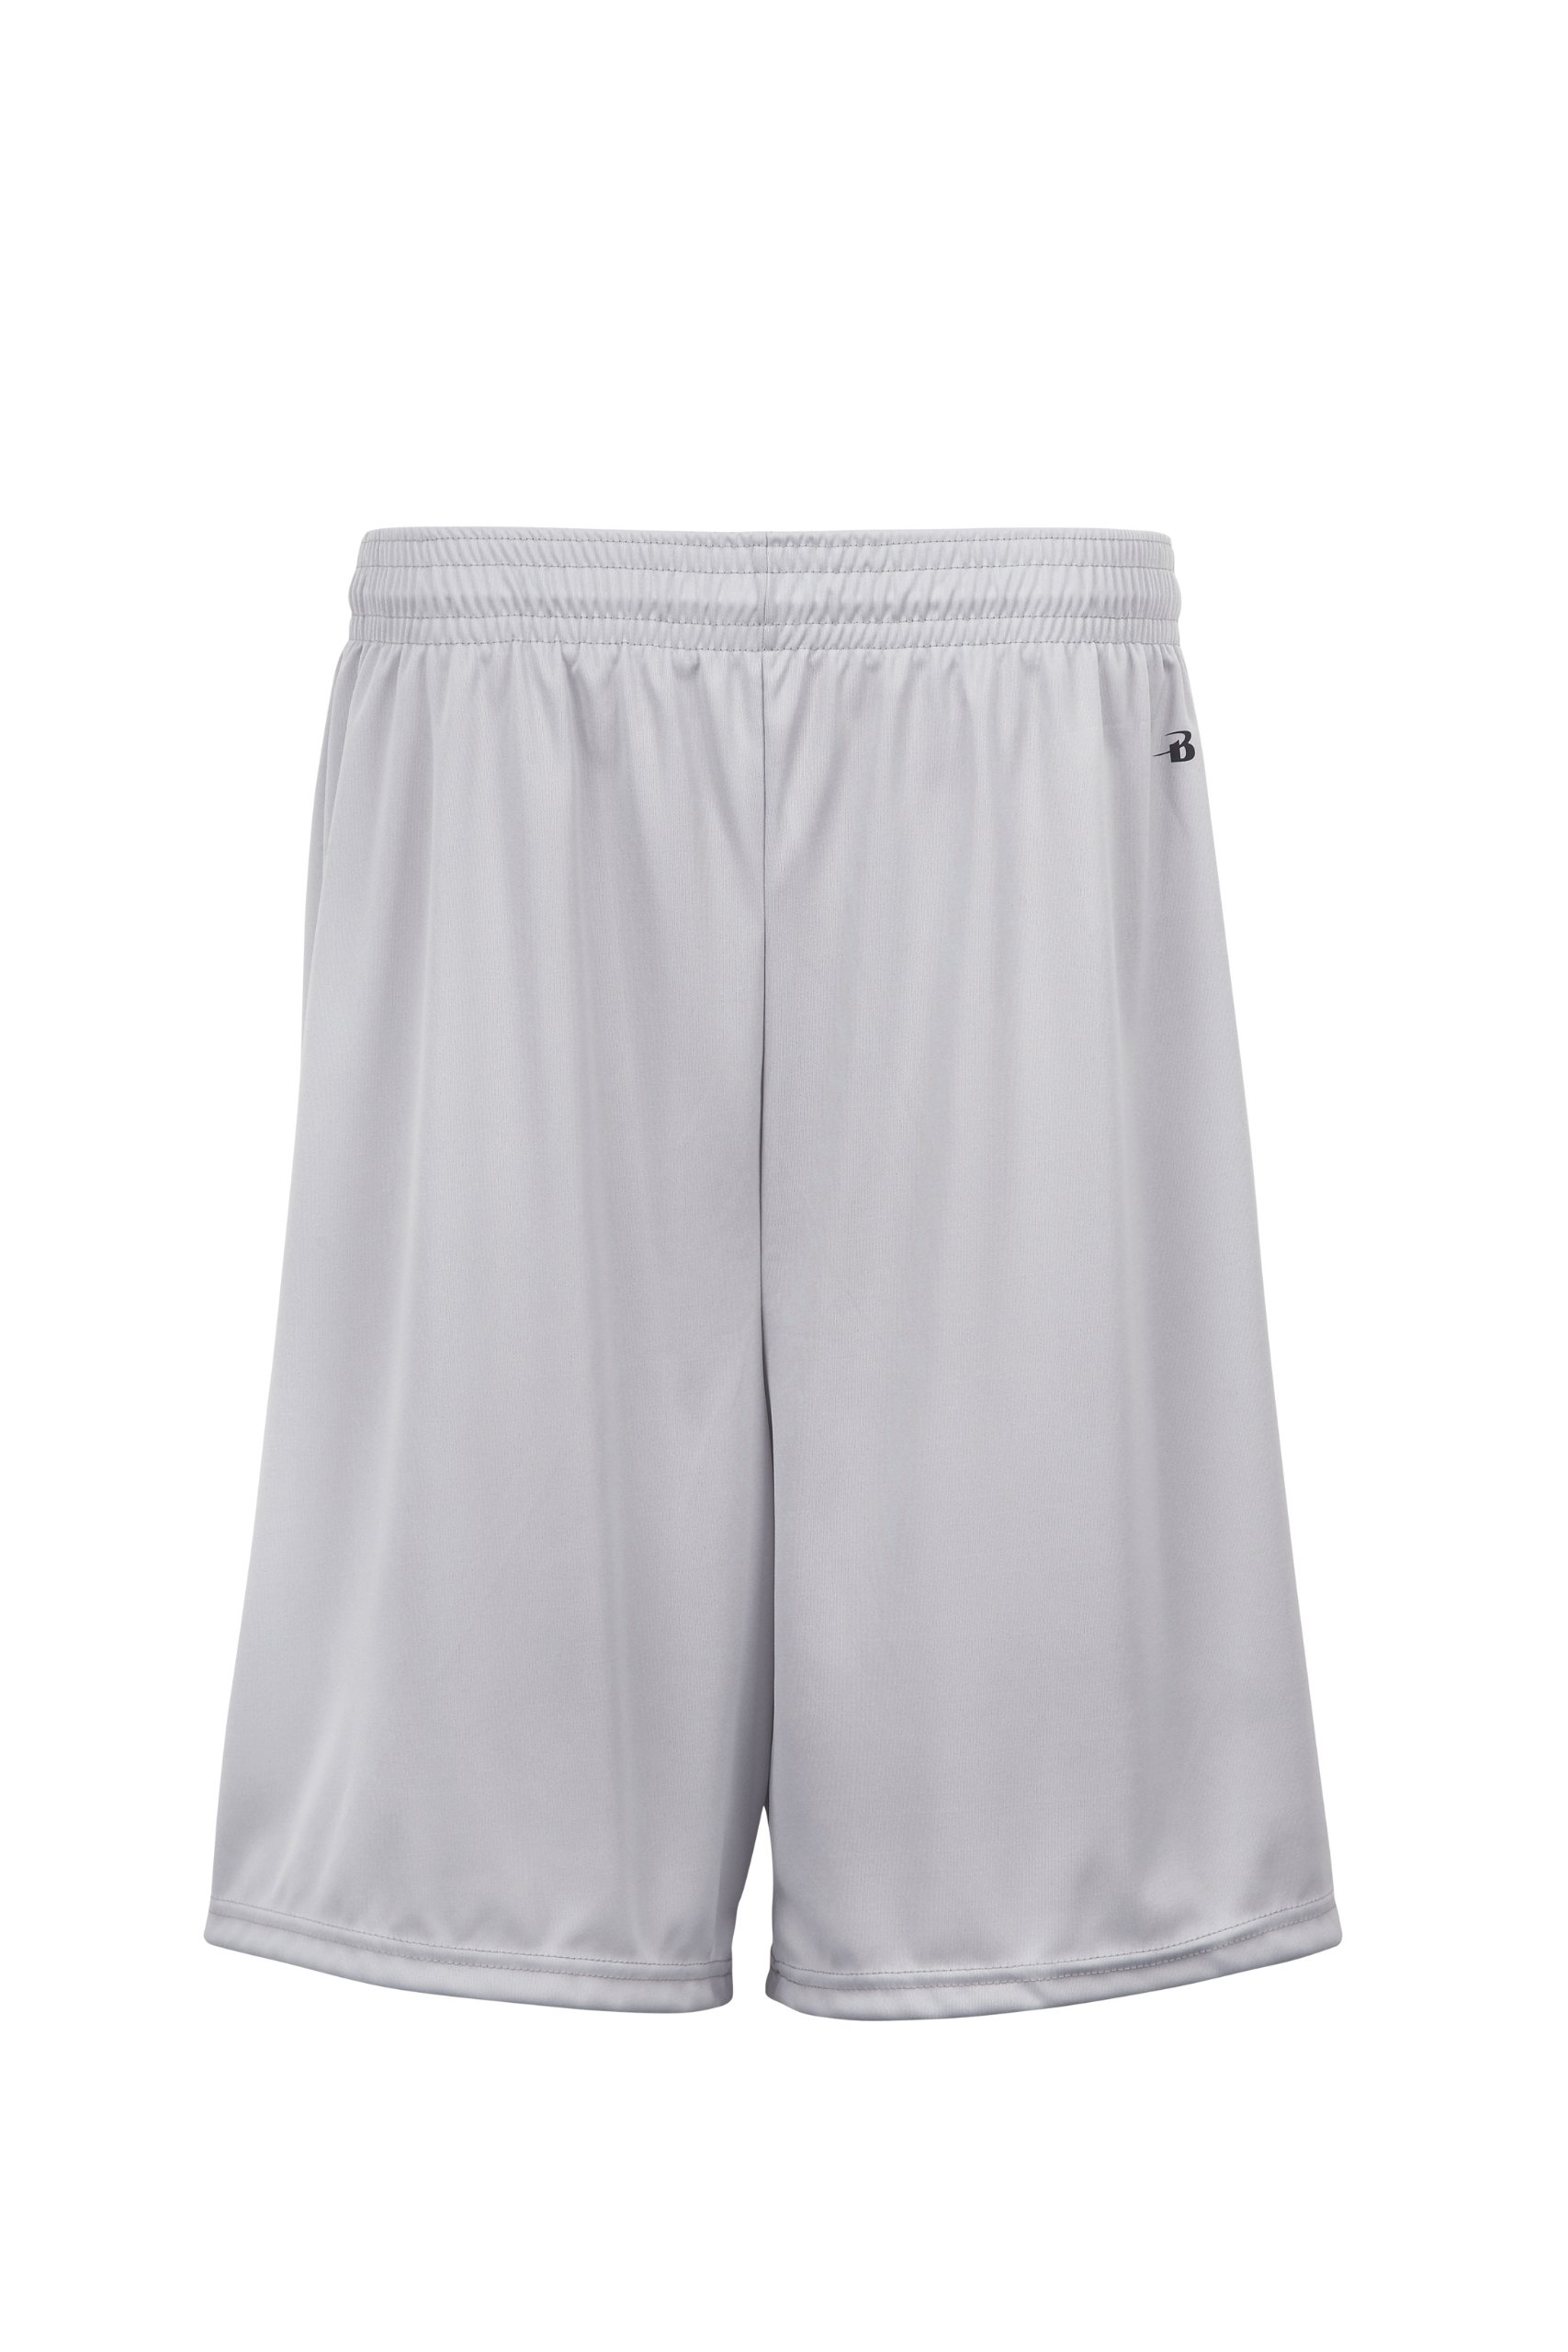 Badger Sportswear Boys' B-Dry Performance Short, Silver, Medium